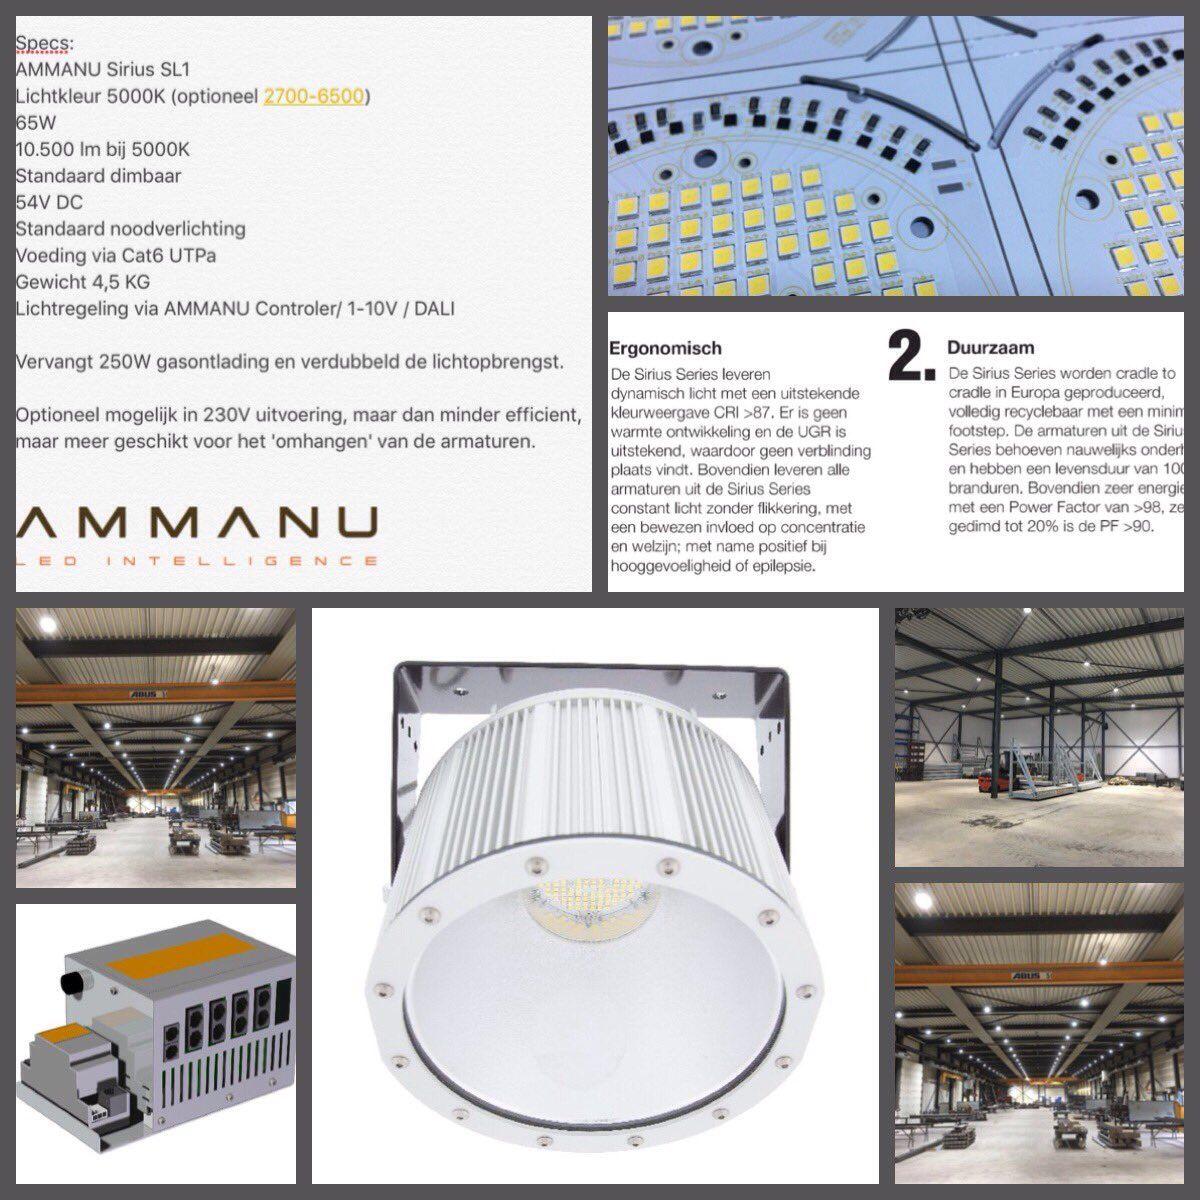 Großzügig Lowe S Maschendrahtplatten Fotos - Elektrische Schaltplan ...